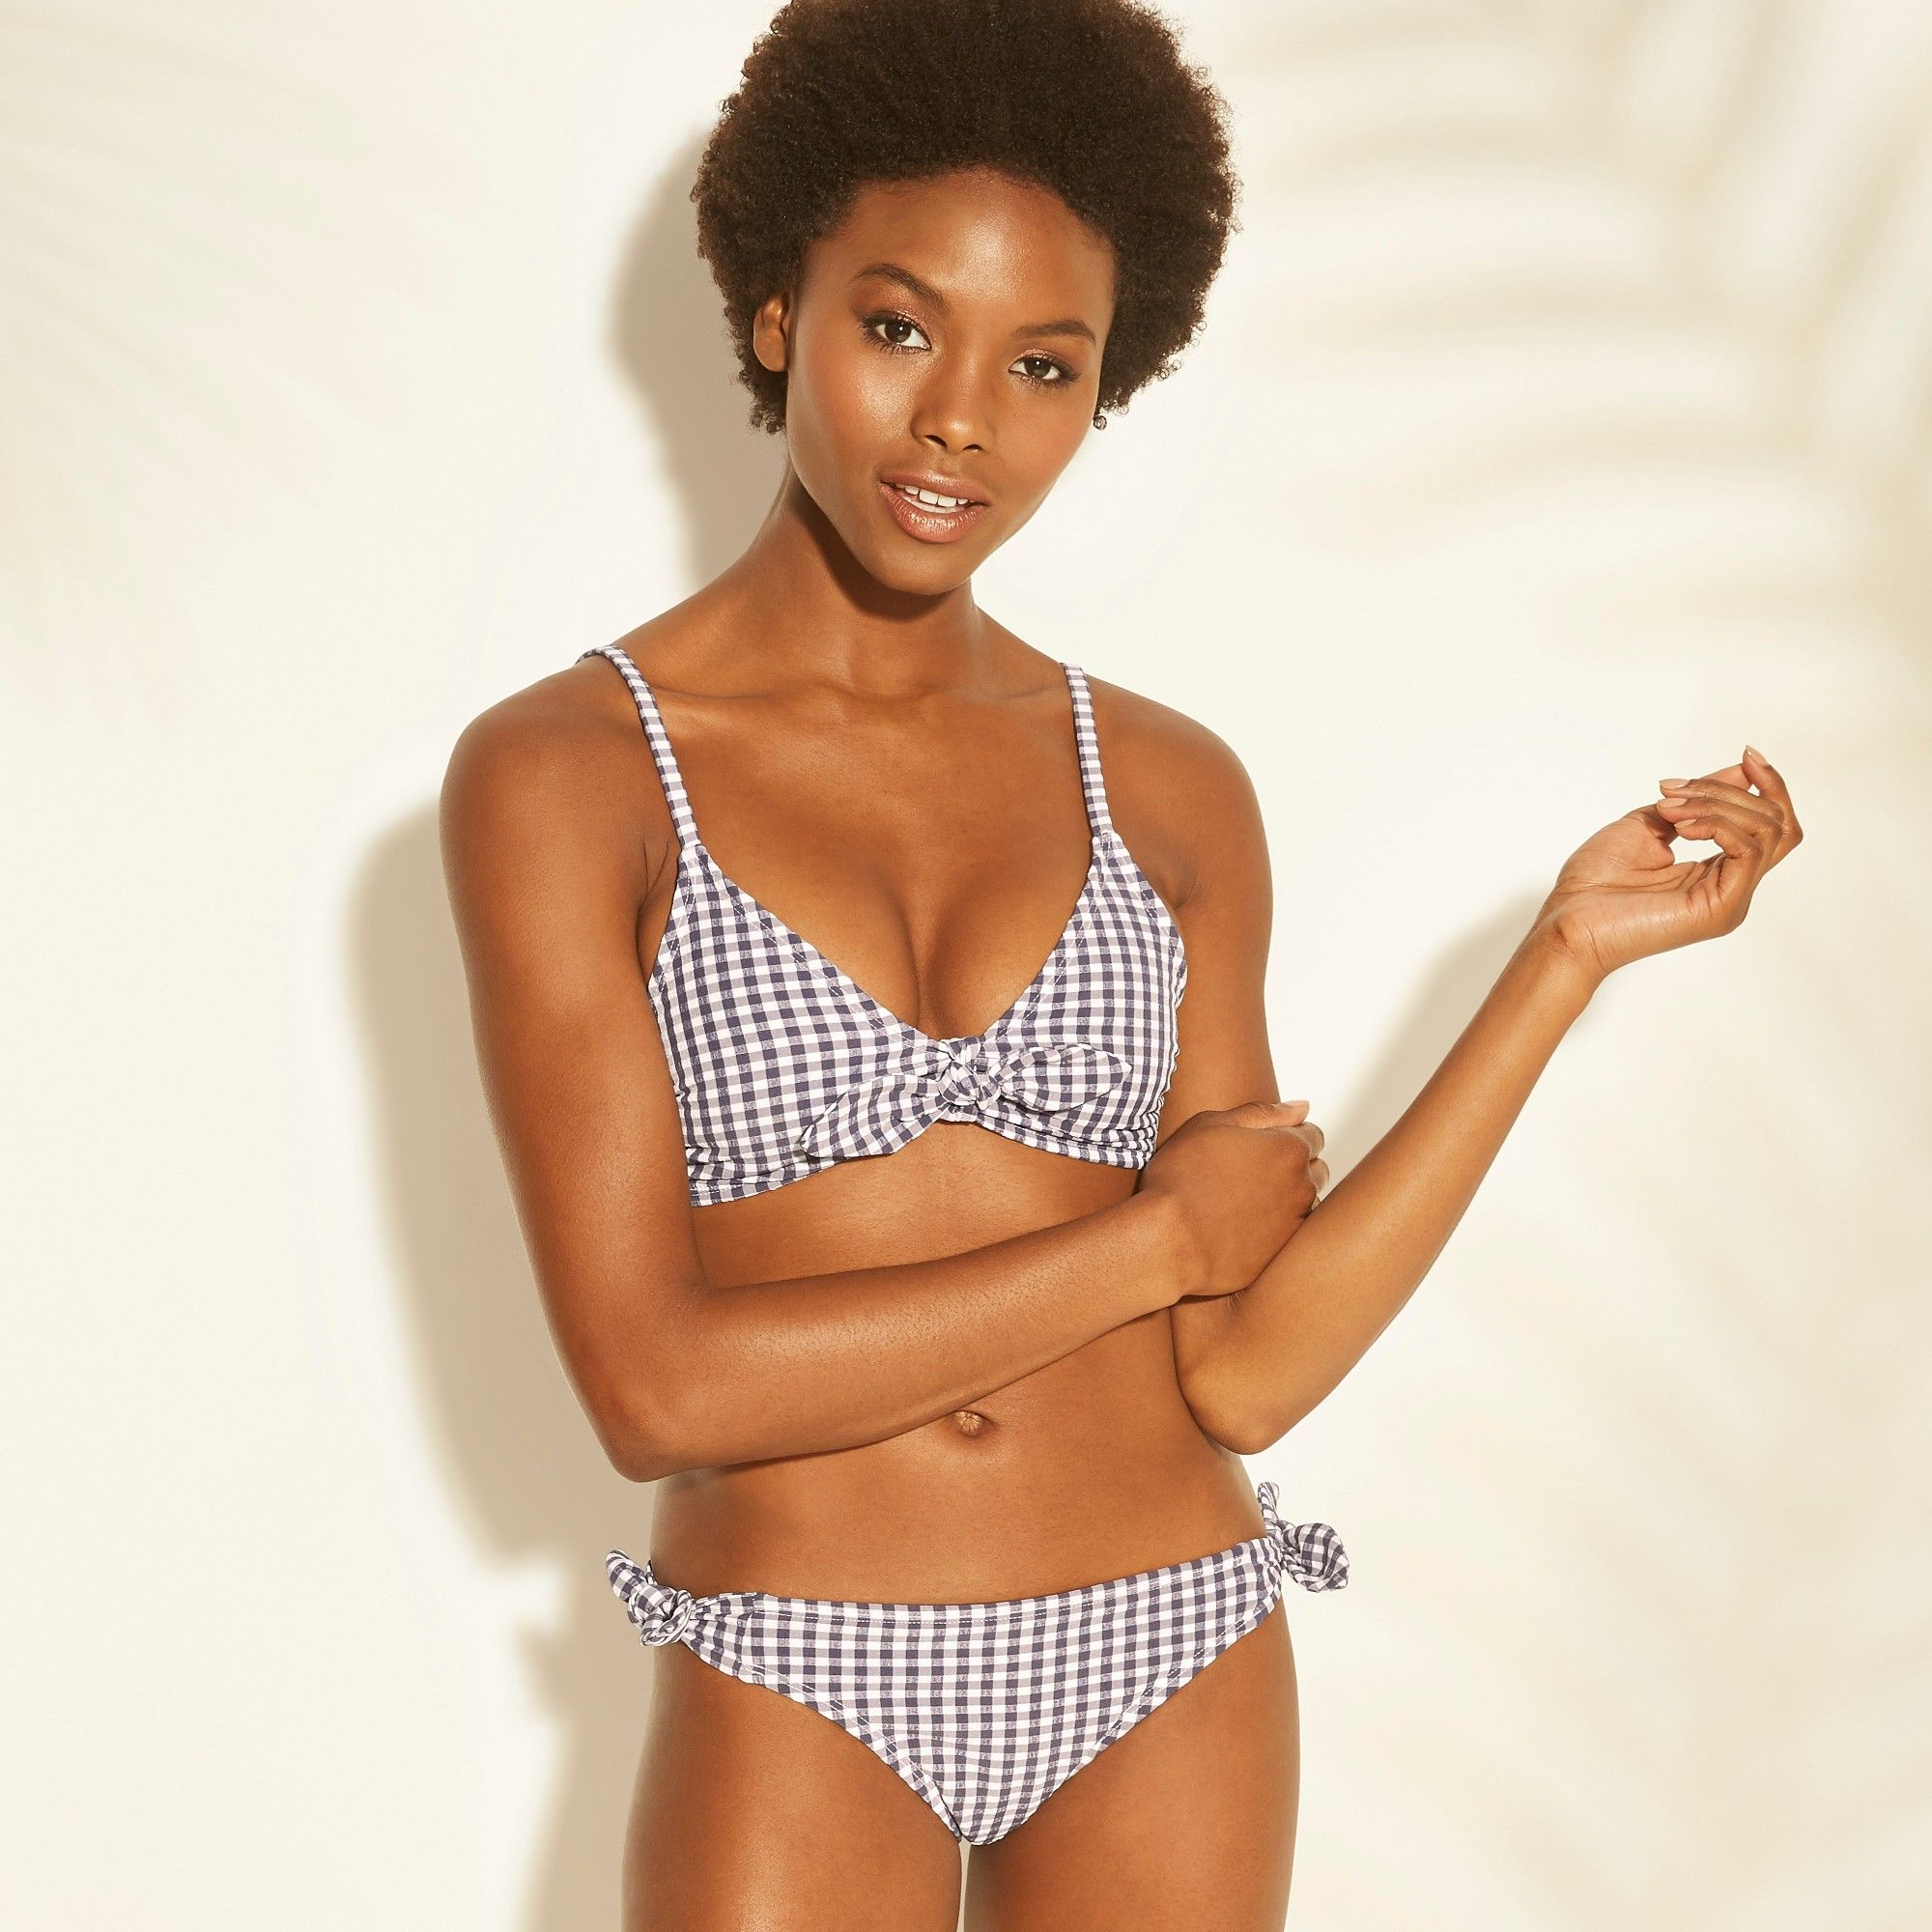 795bb6821 Women s Tie Front Gingham Bralette Bikini Top - Xhilaration Navy (Blue)  Gingham M